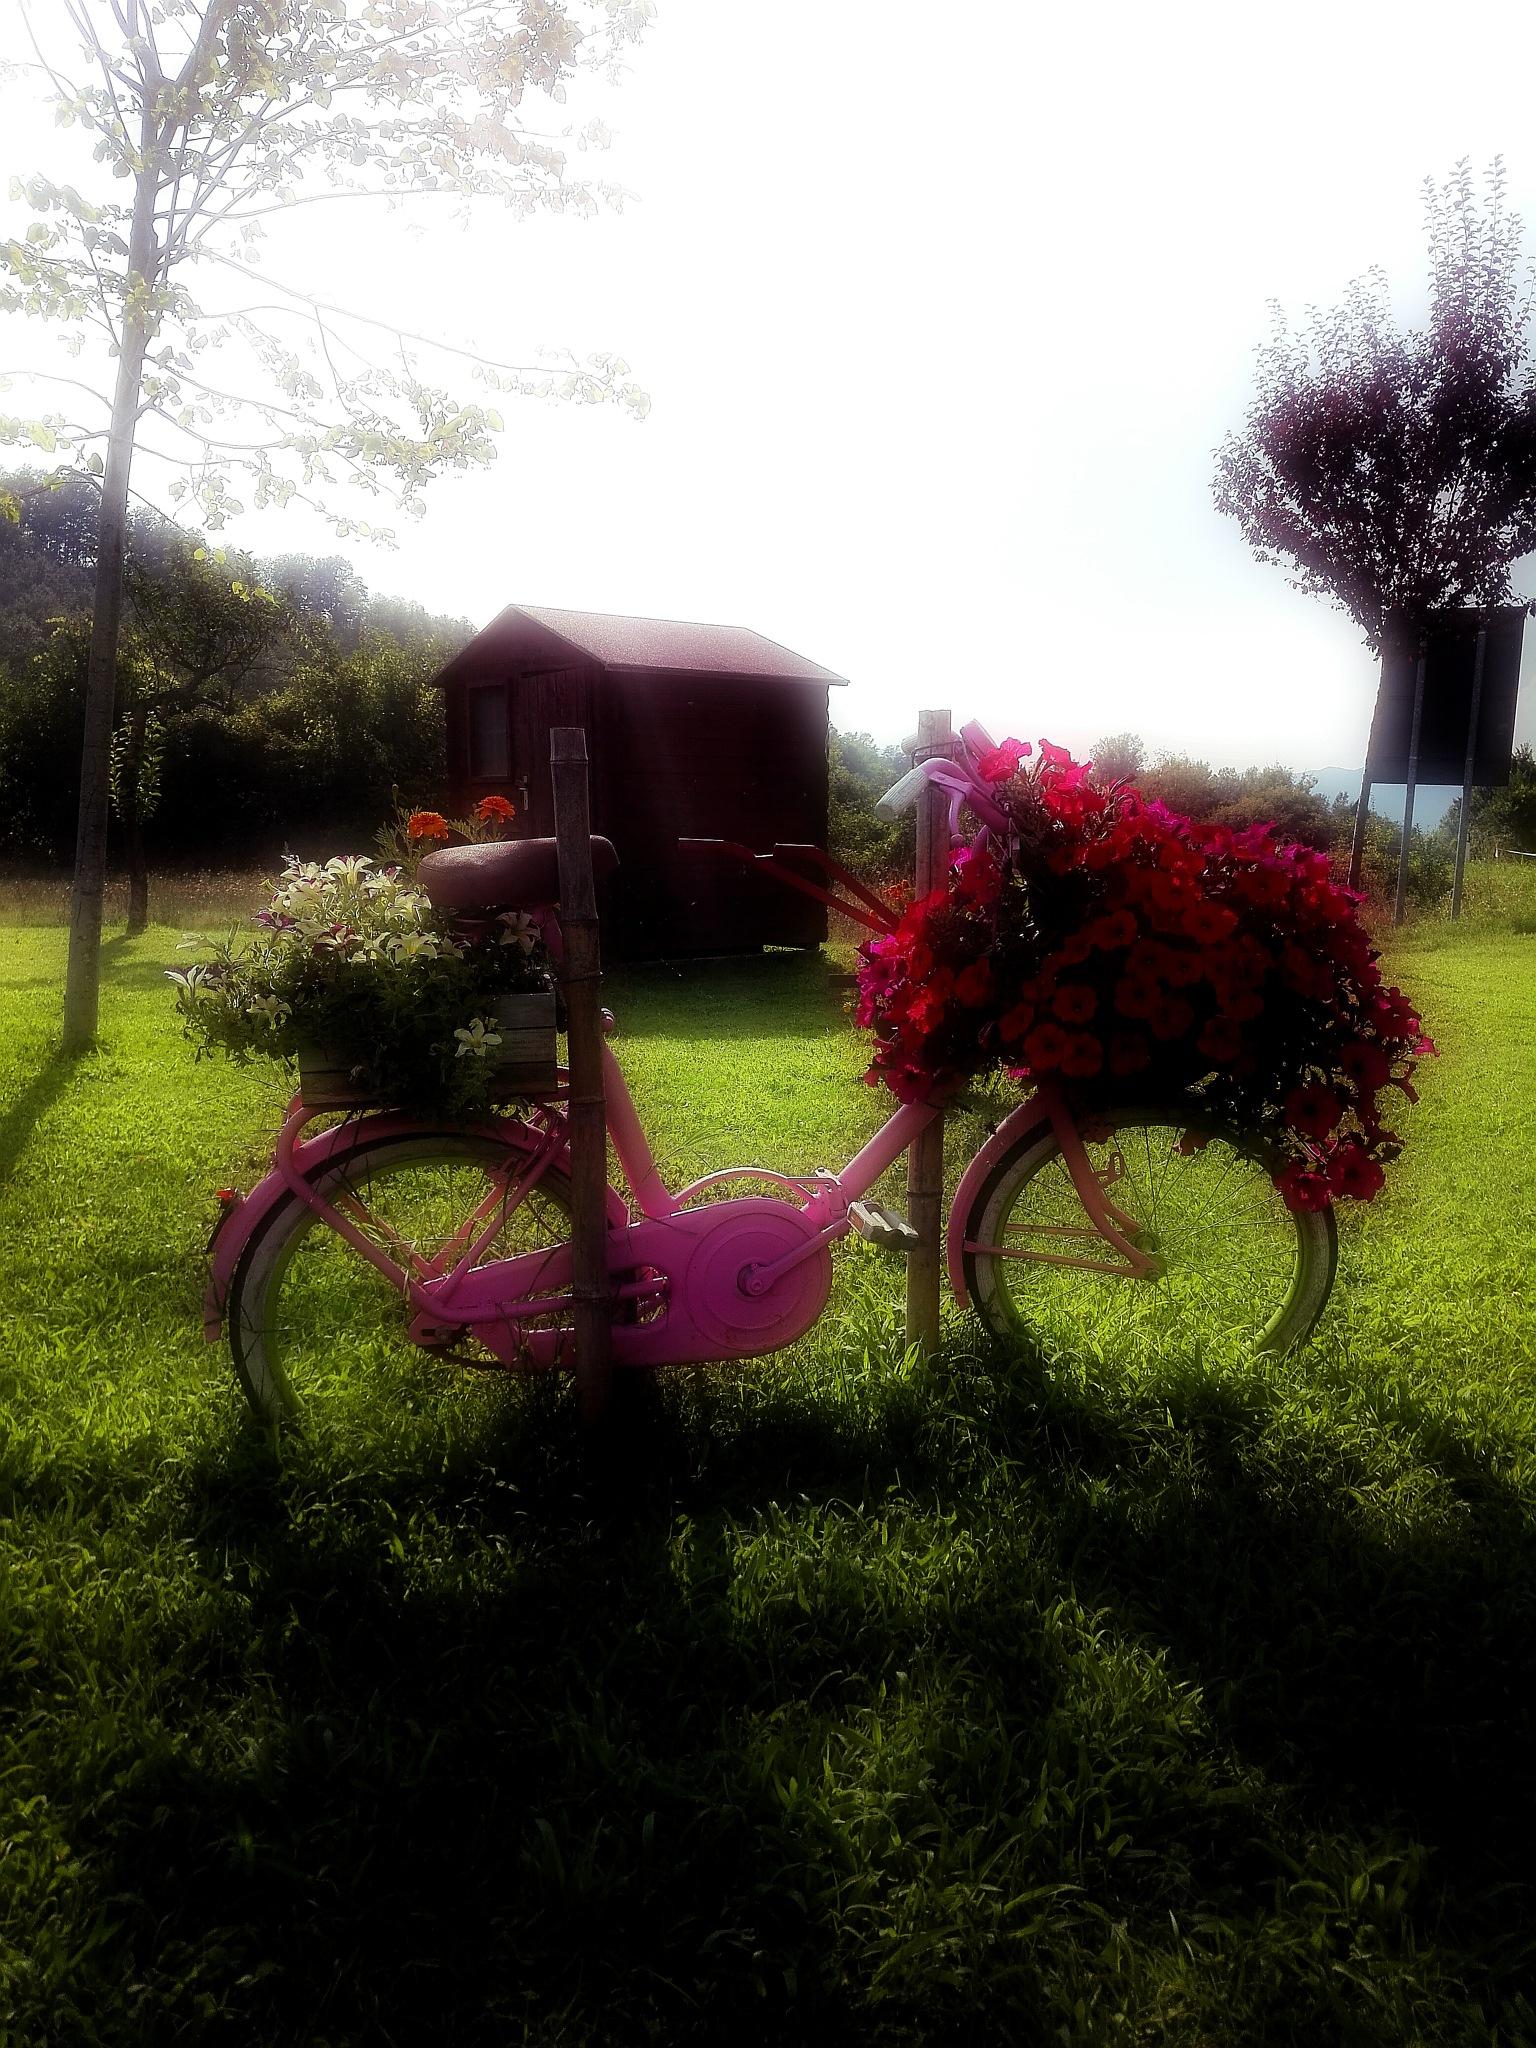 the flowers on the bike by  Gaelle Le Meur